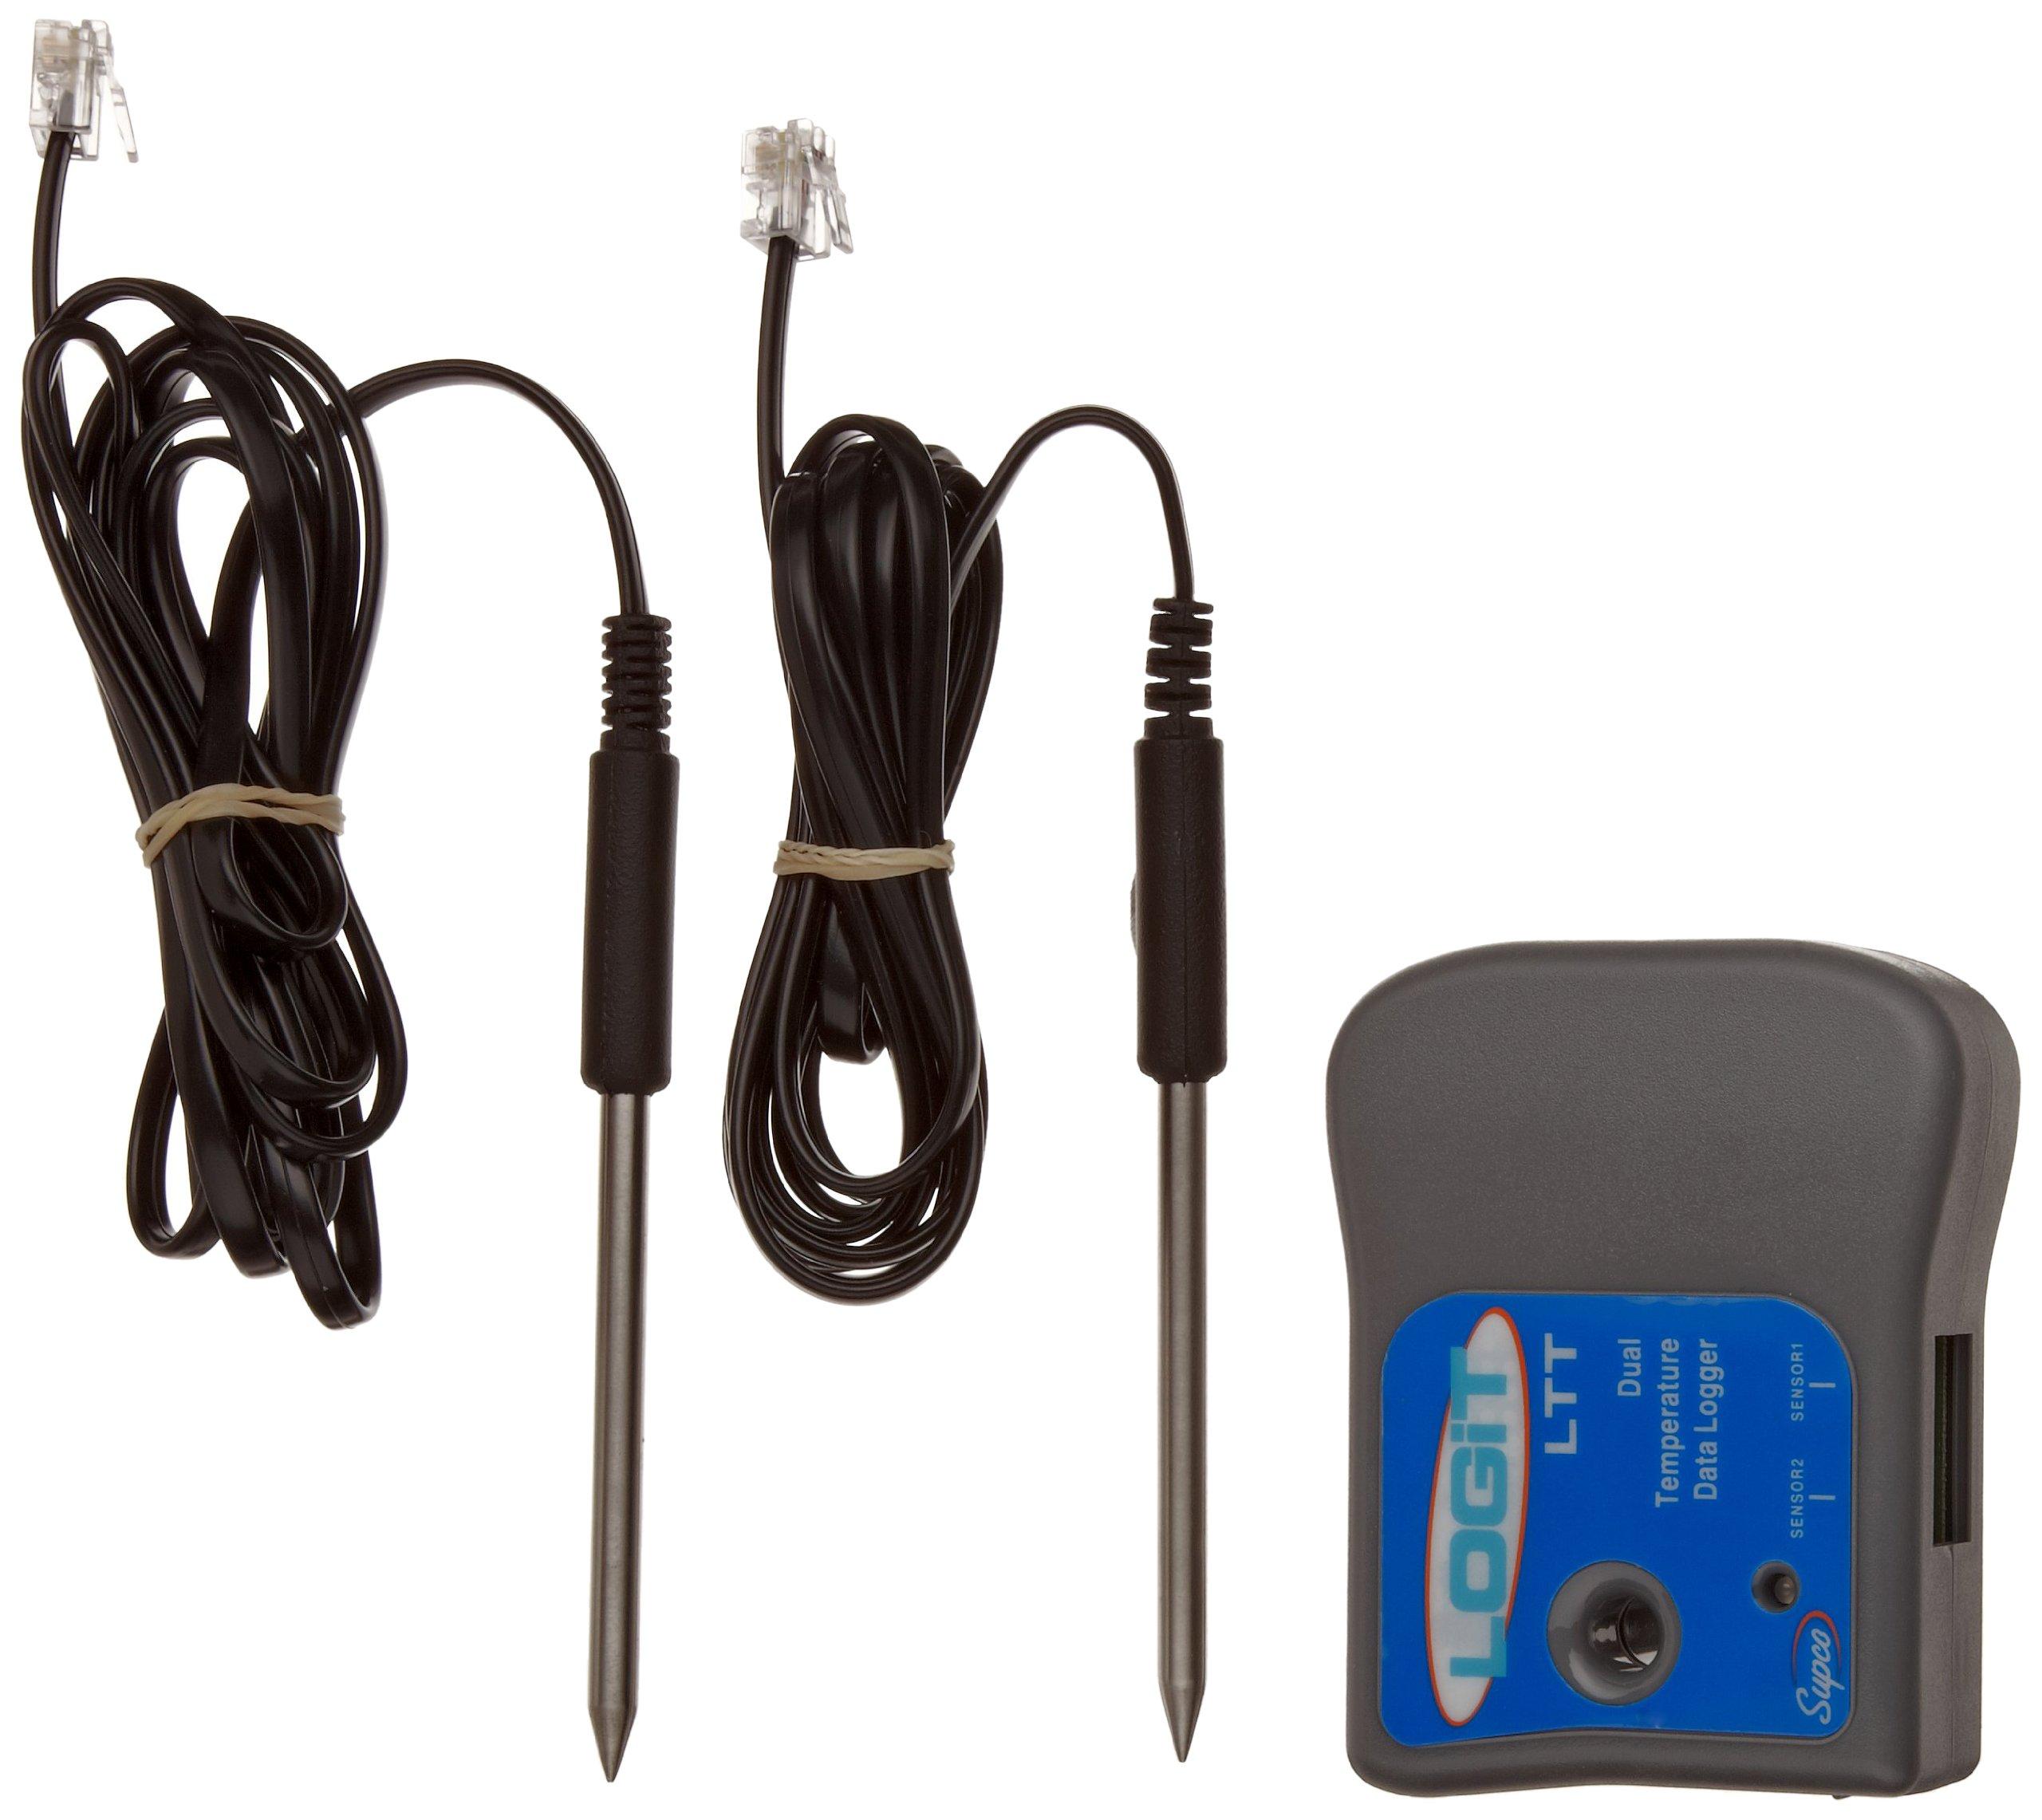 Supco LTT LOGiT Dual Temperature Data Logger, 3'' Length x 2-1/2'' Width x 1-3/32'' Height